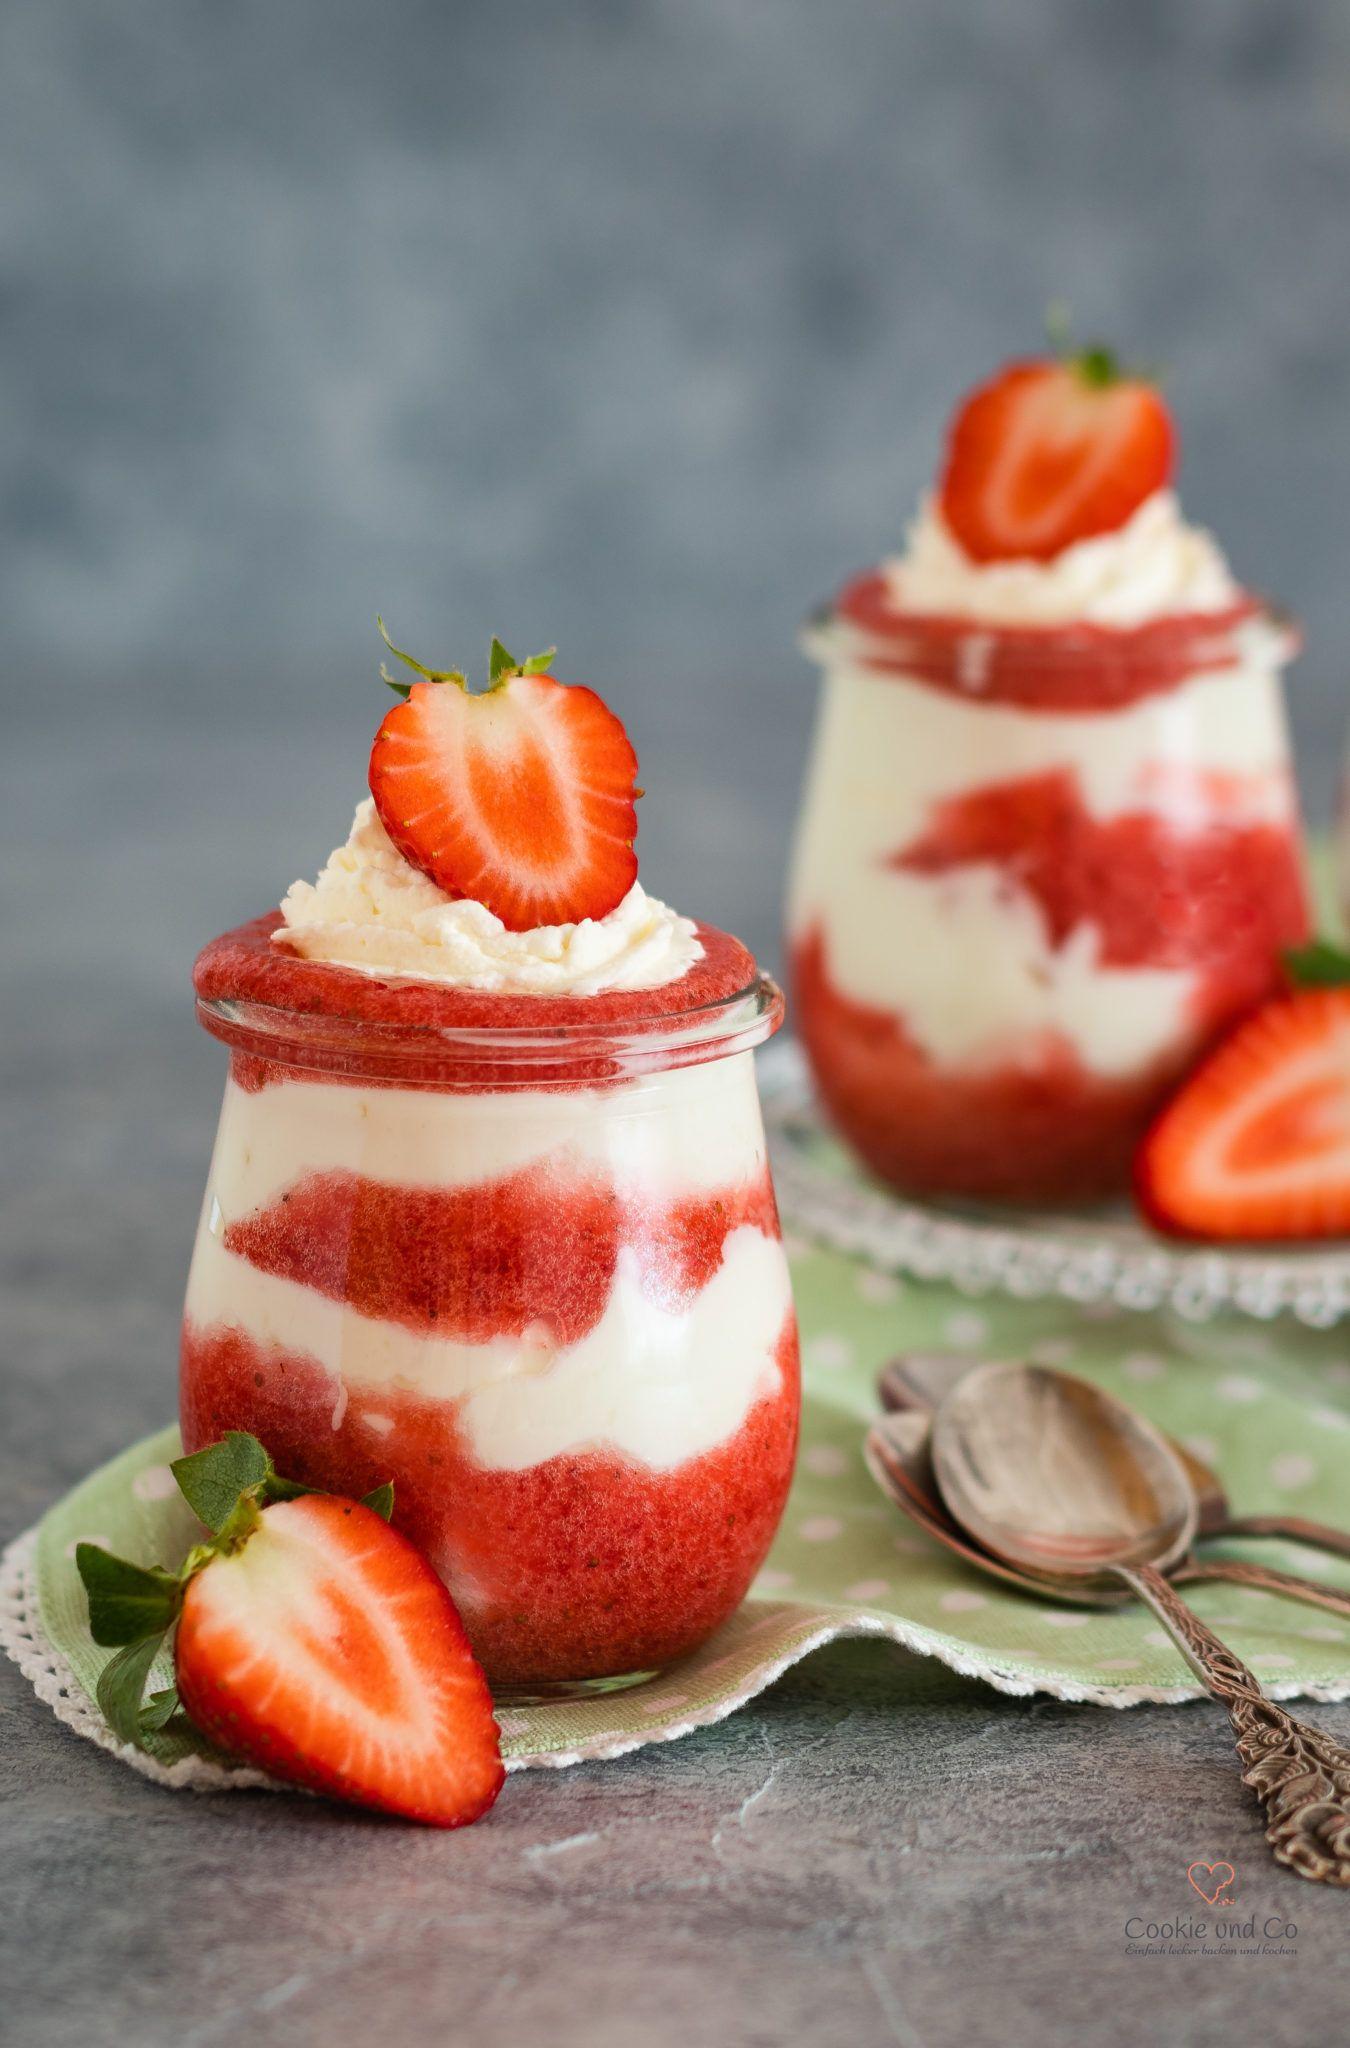 Erdbeer-Traum (Dessert im Glas) images